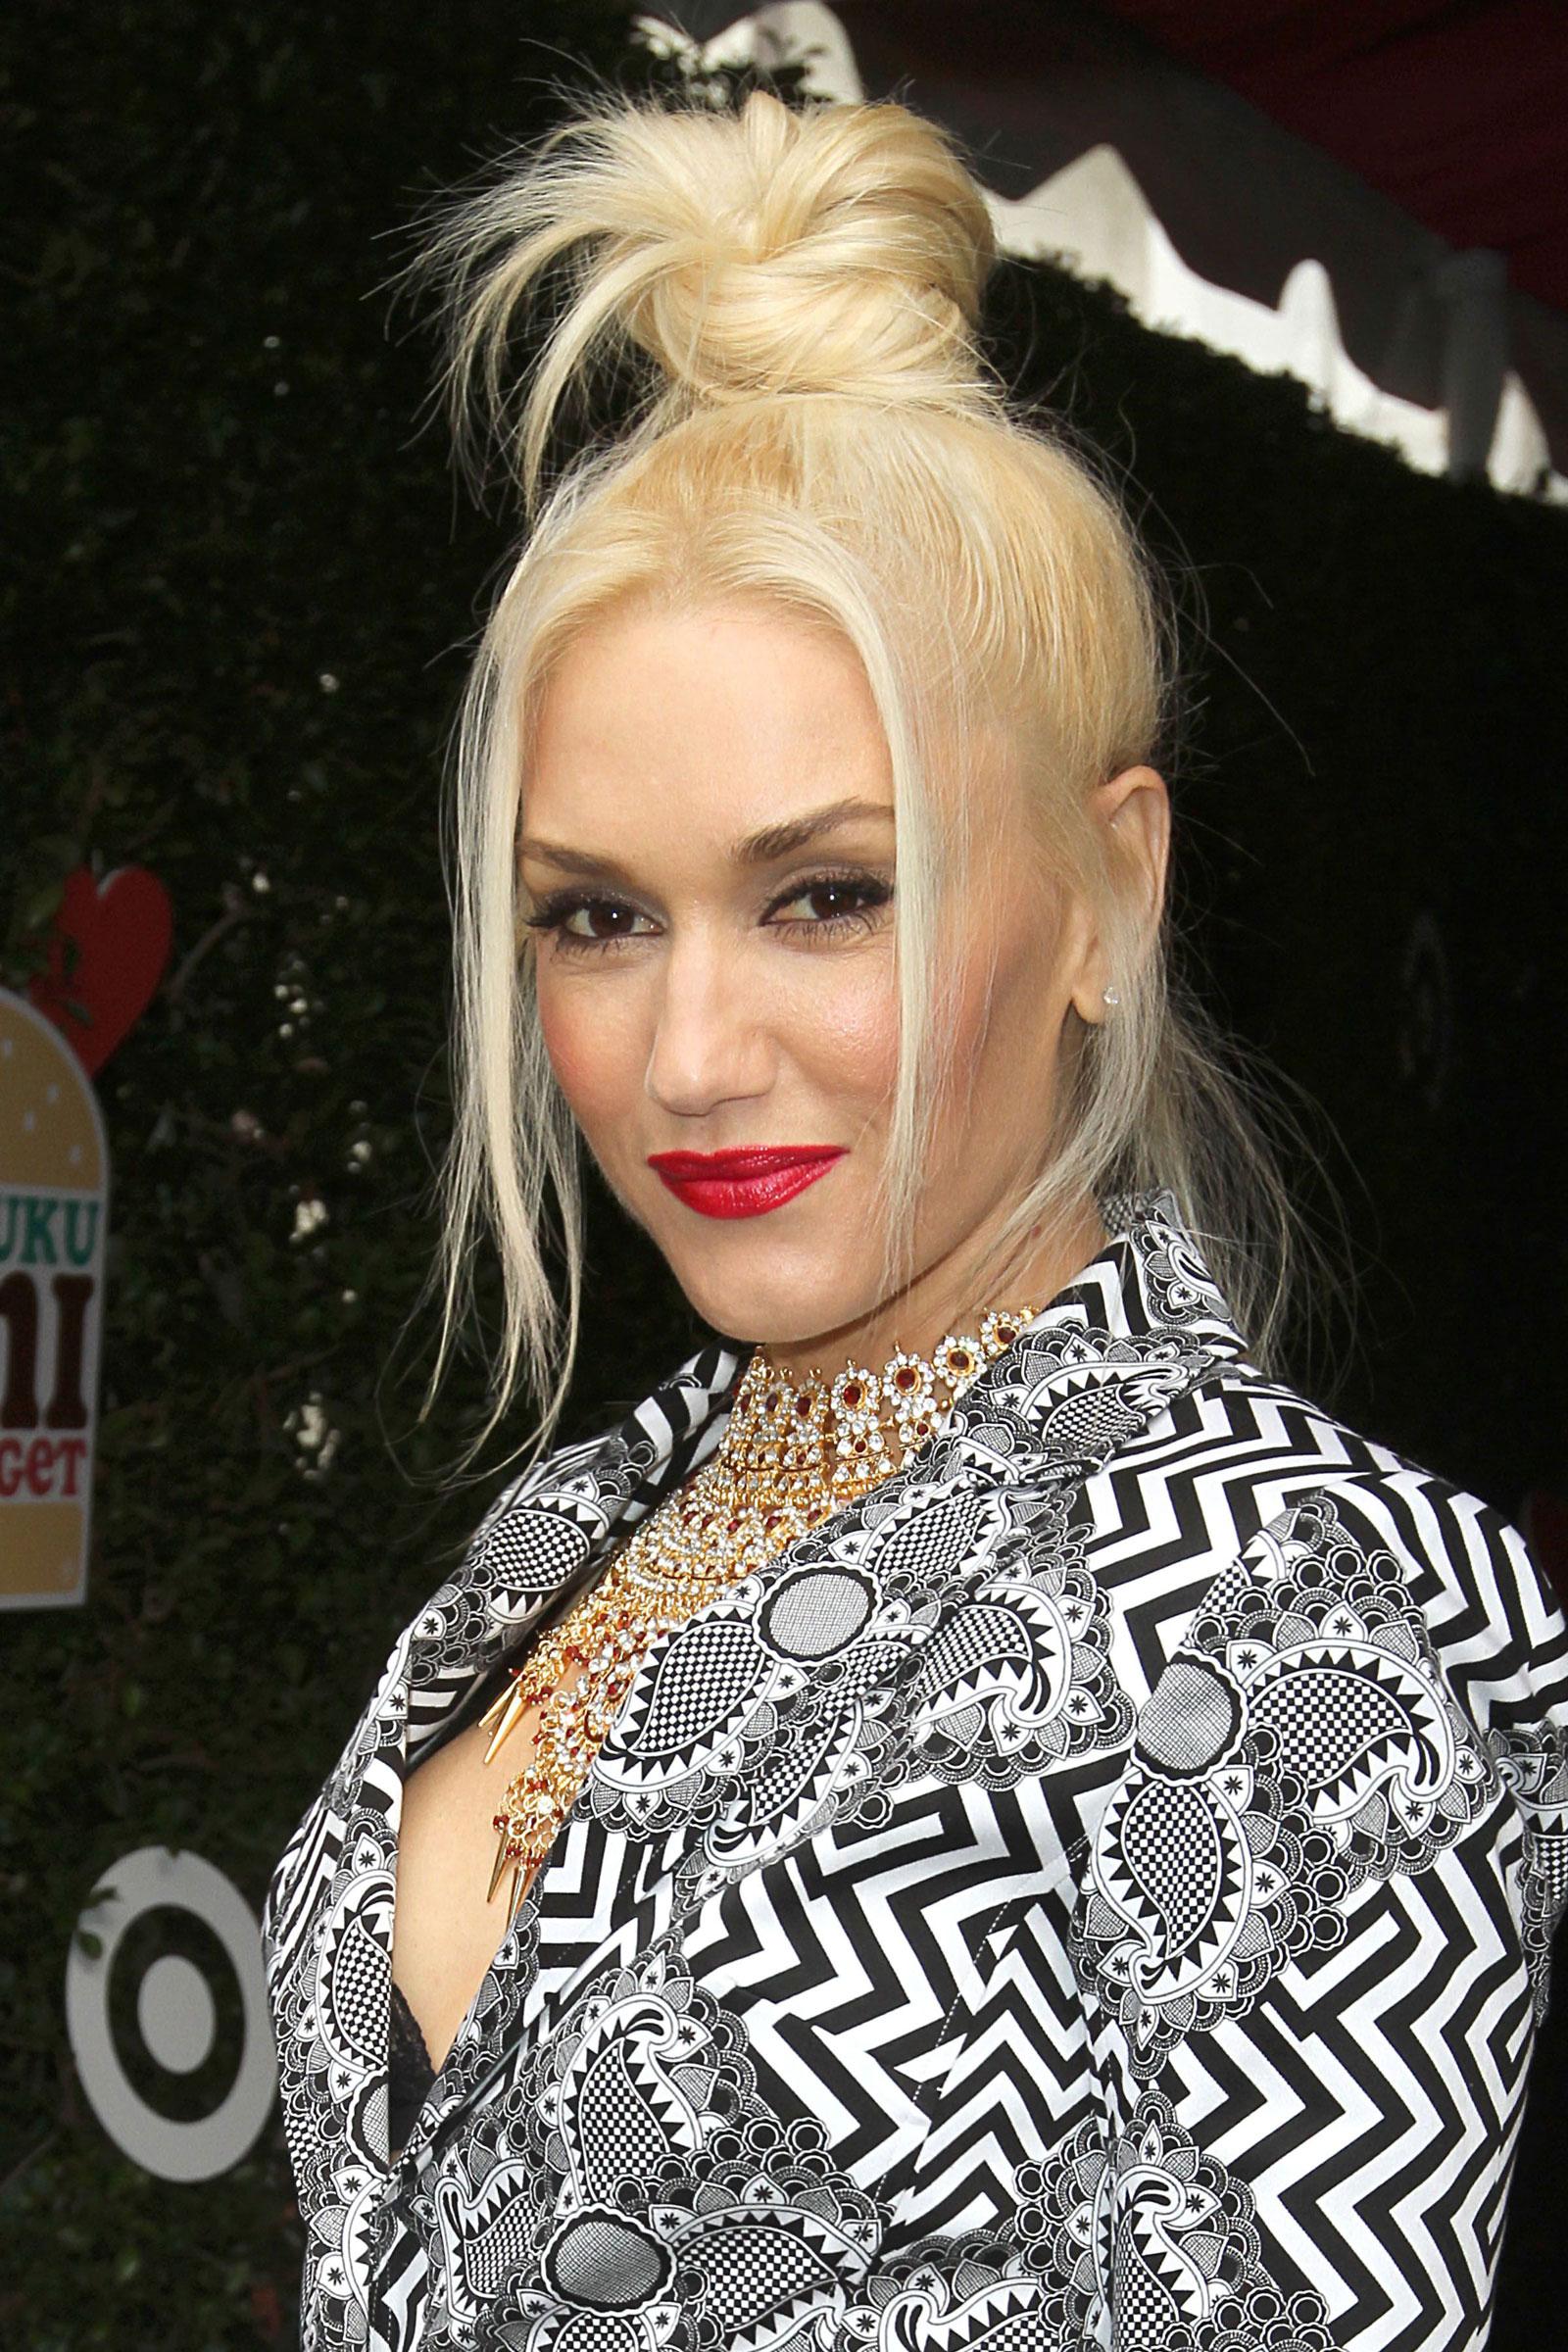 Gwen Stefani - Gallery